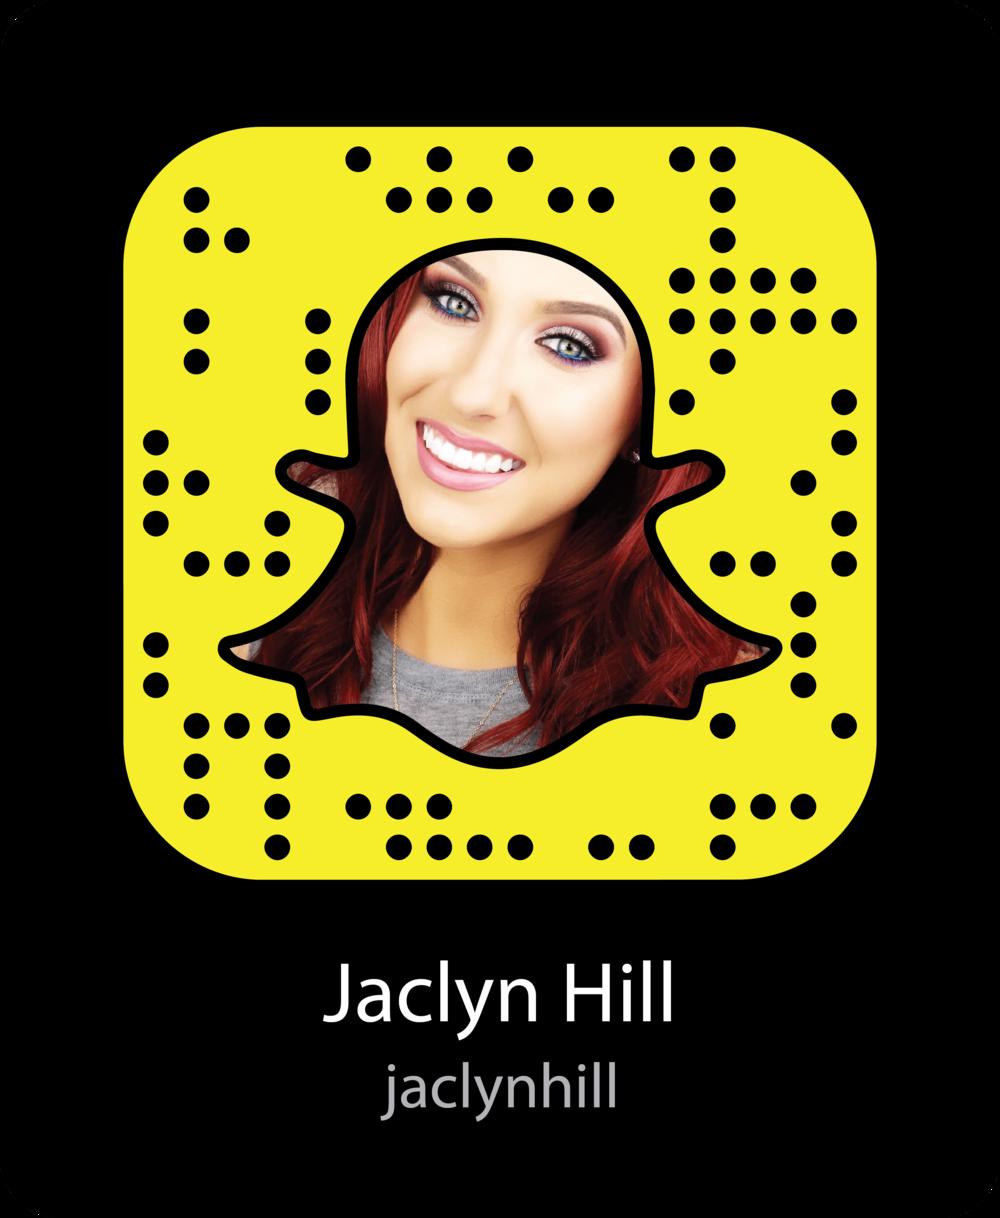 jaclyn-hill-vine-celebrity-snapchat-snapcode